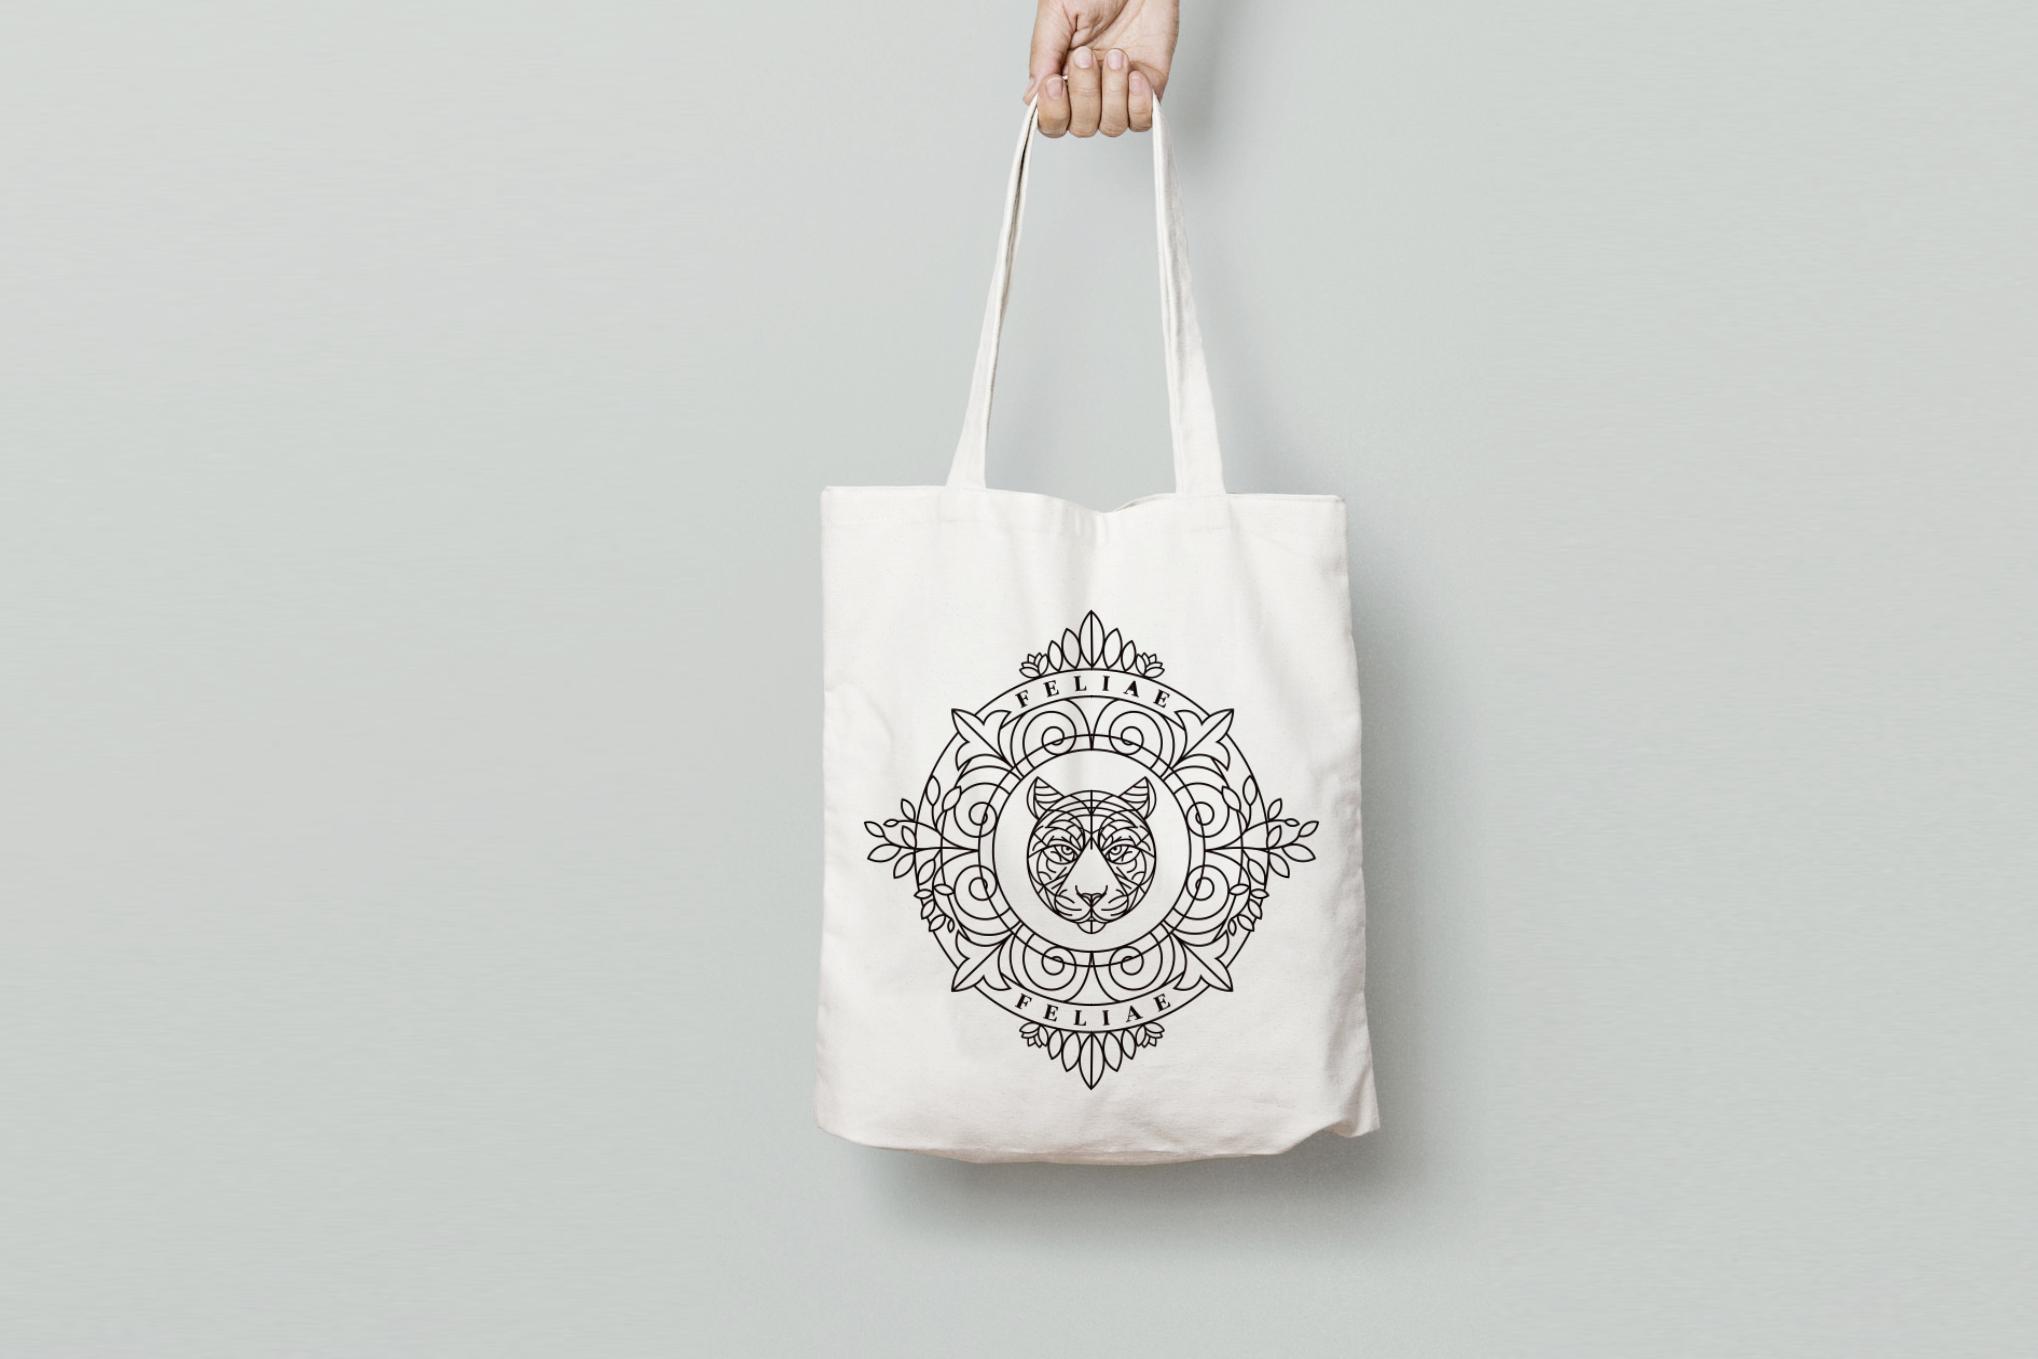 bag2-1497621605.jpg